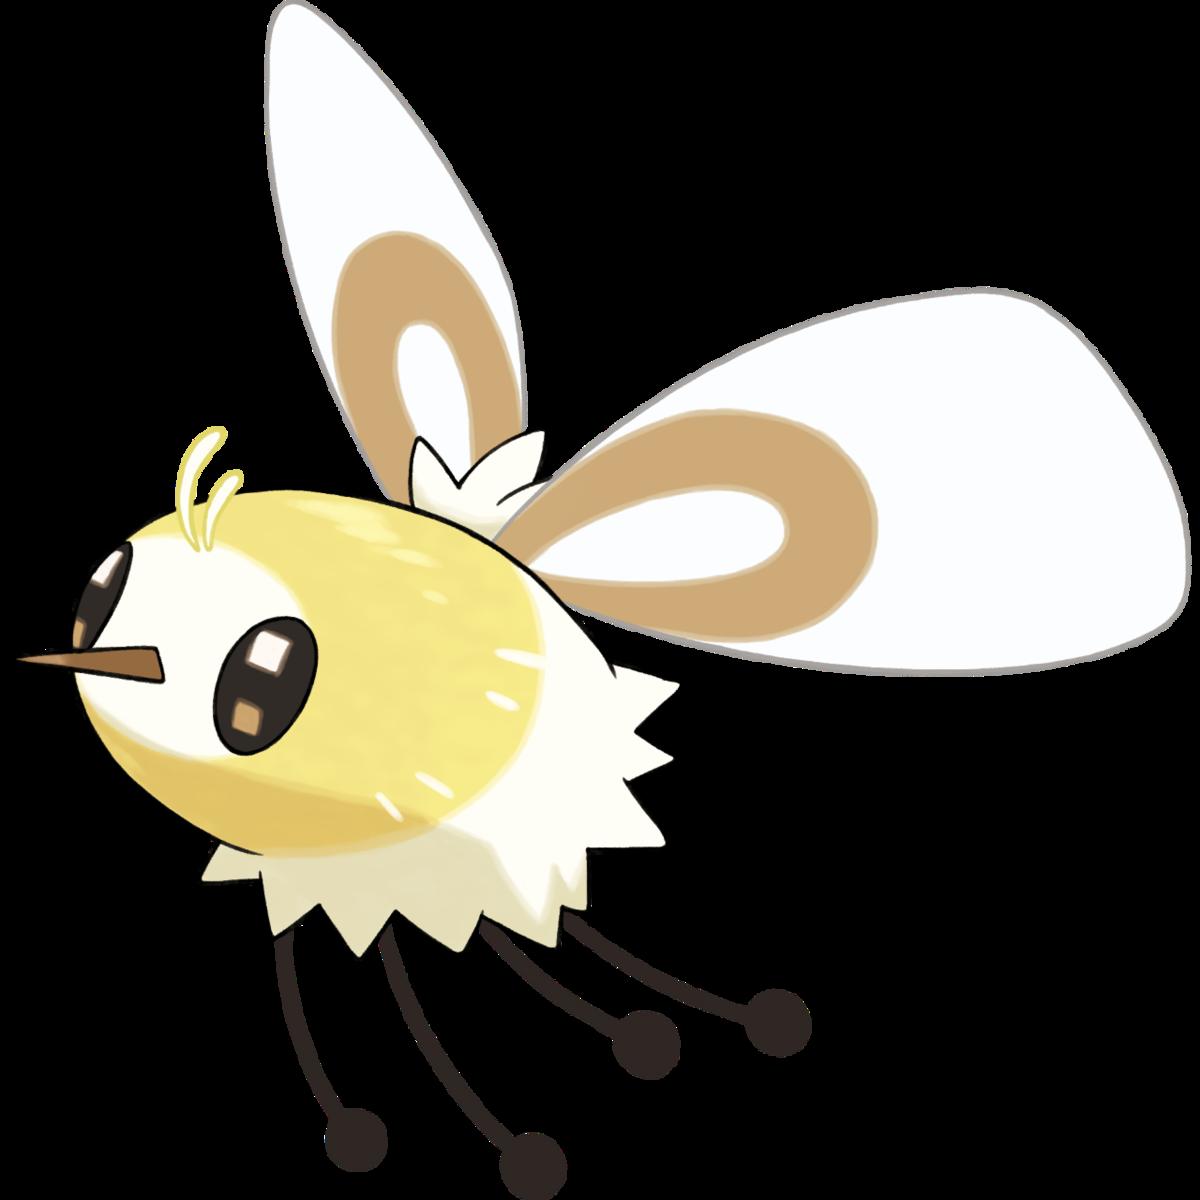 Face toward sun clipart banner free download Cutiefly (Pokémon) - Bulbapedia, the community-driven Pokémon ... banner free download